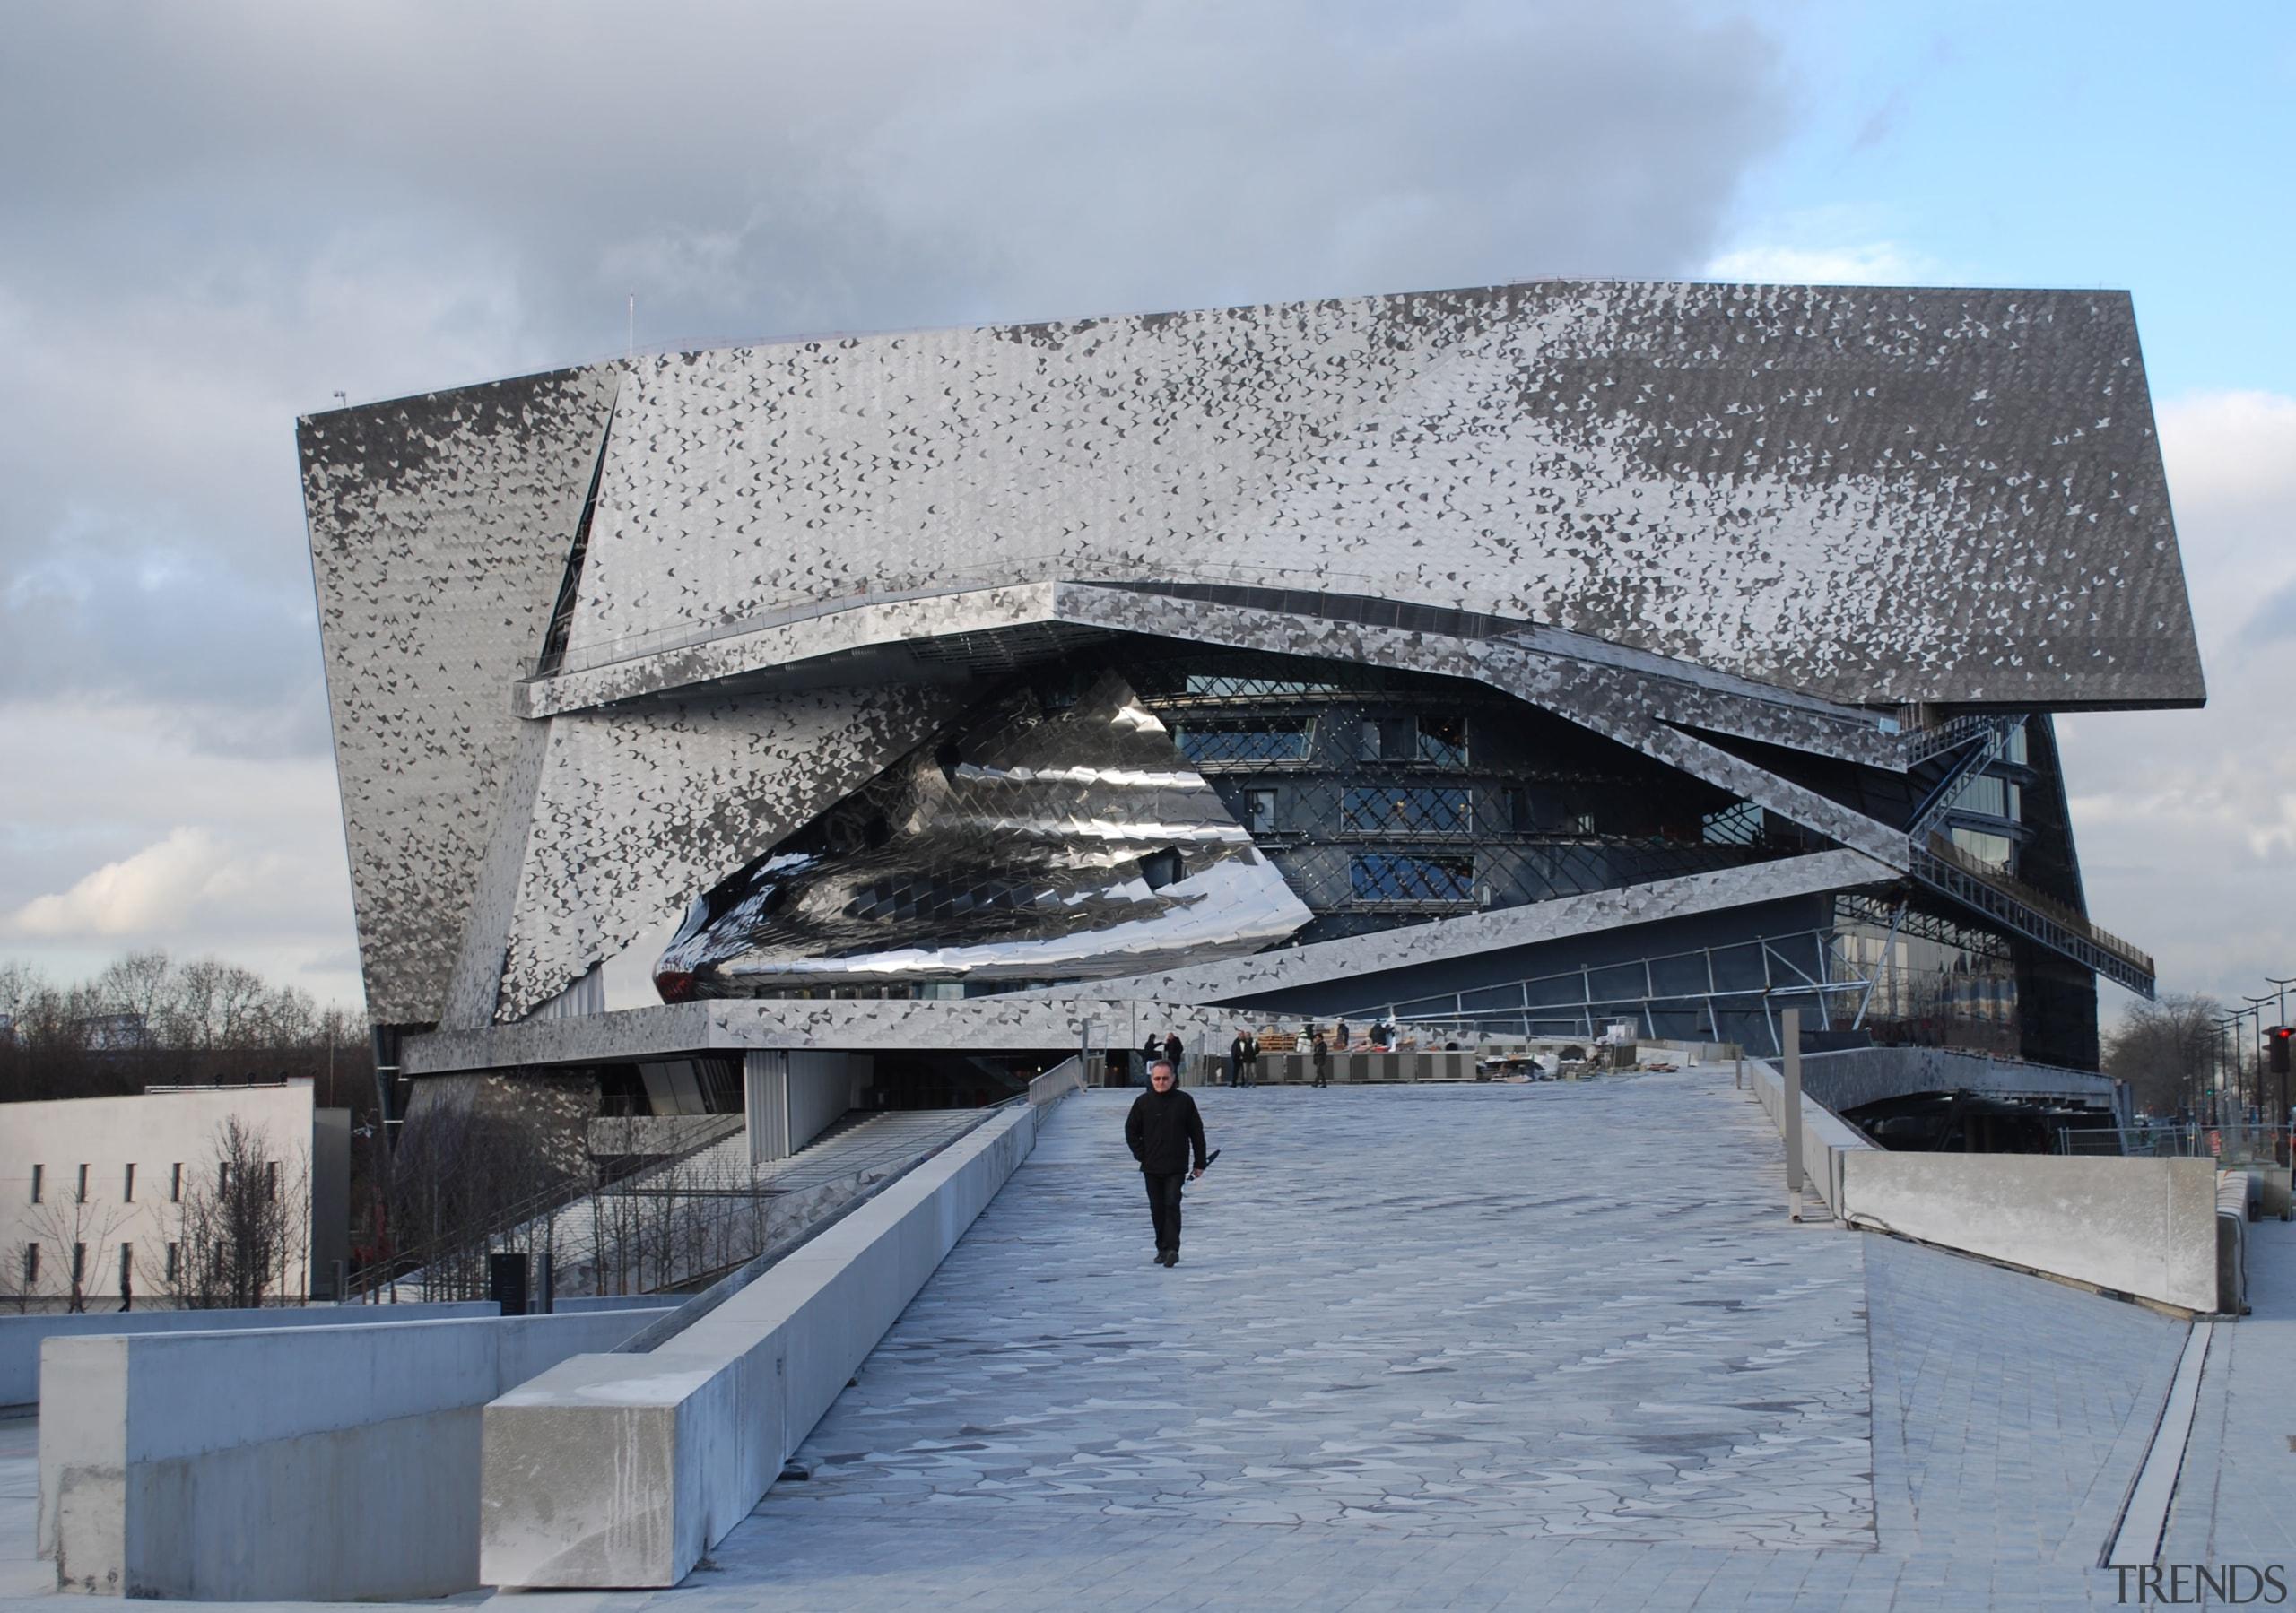 The design of the Philharmonie de Paris concert architecture, building, fixed link, sky, structure, water, gray